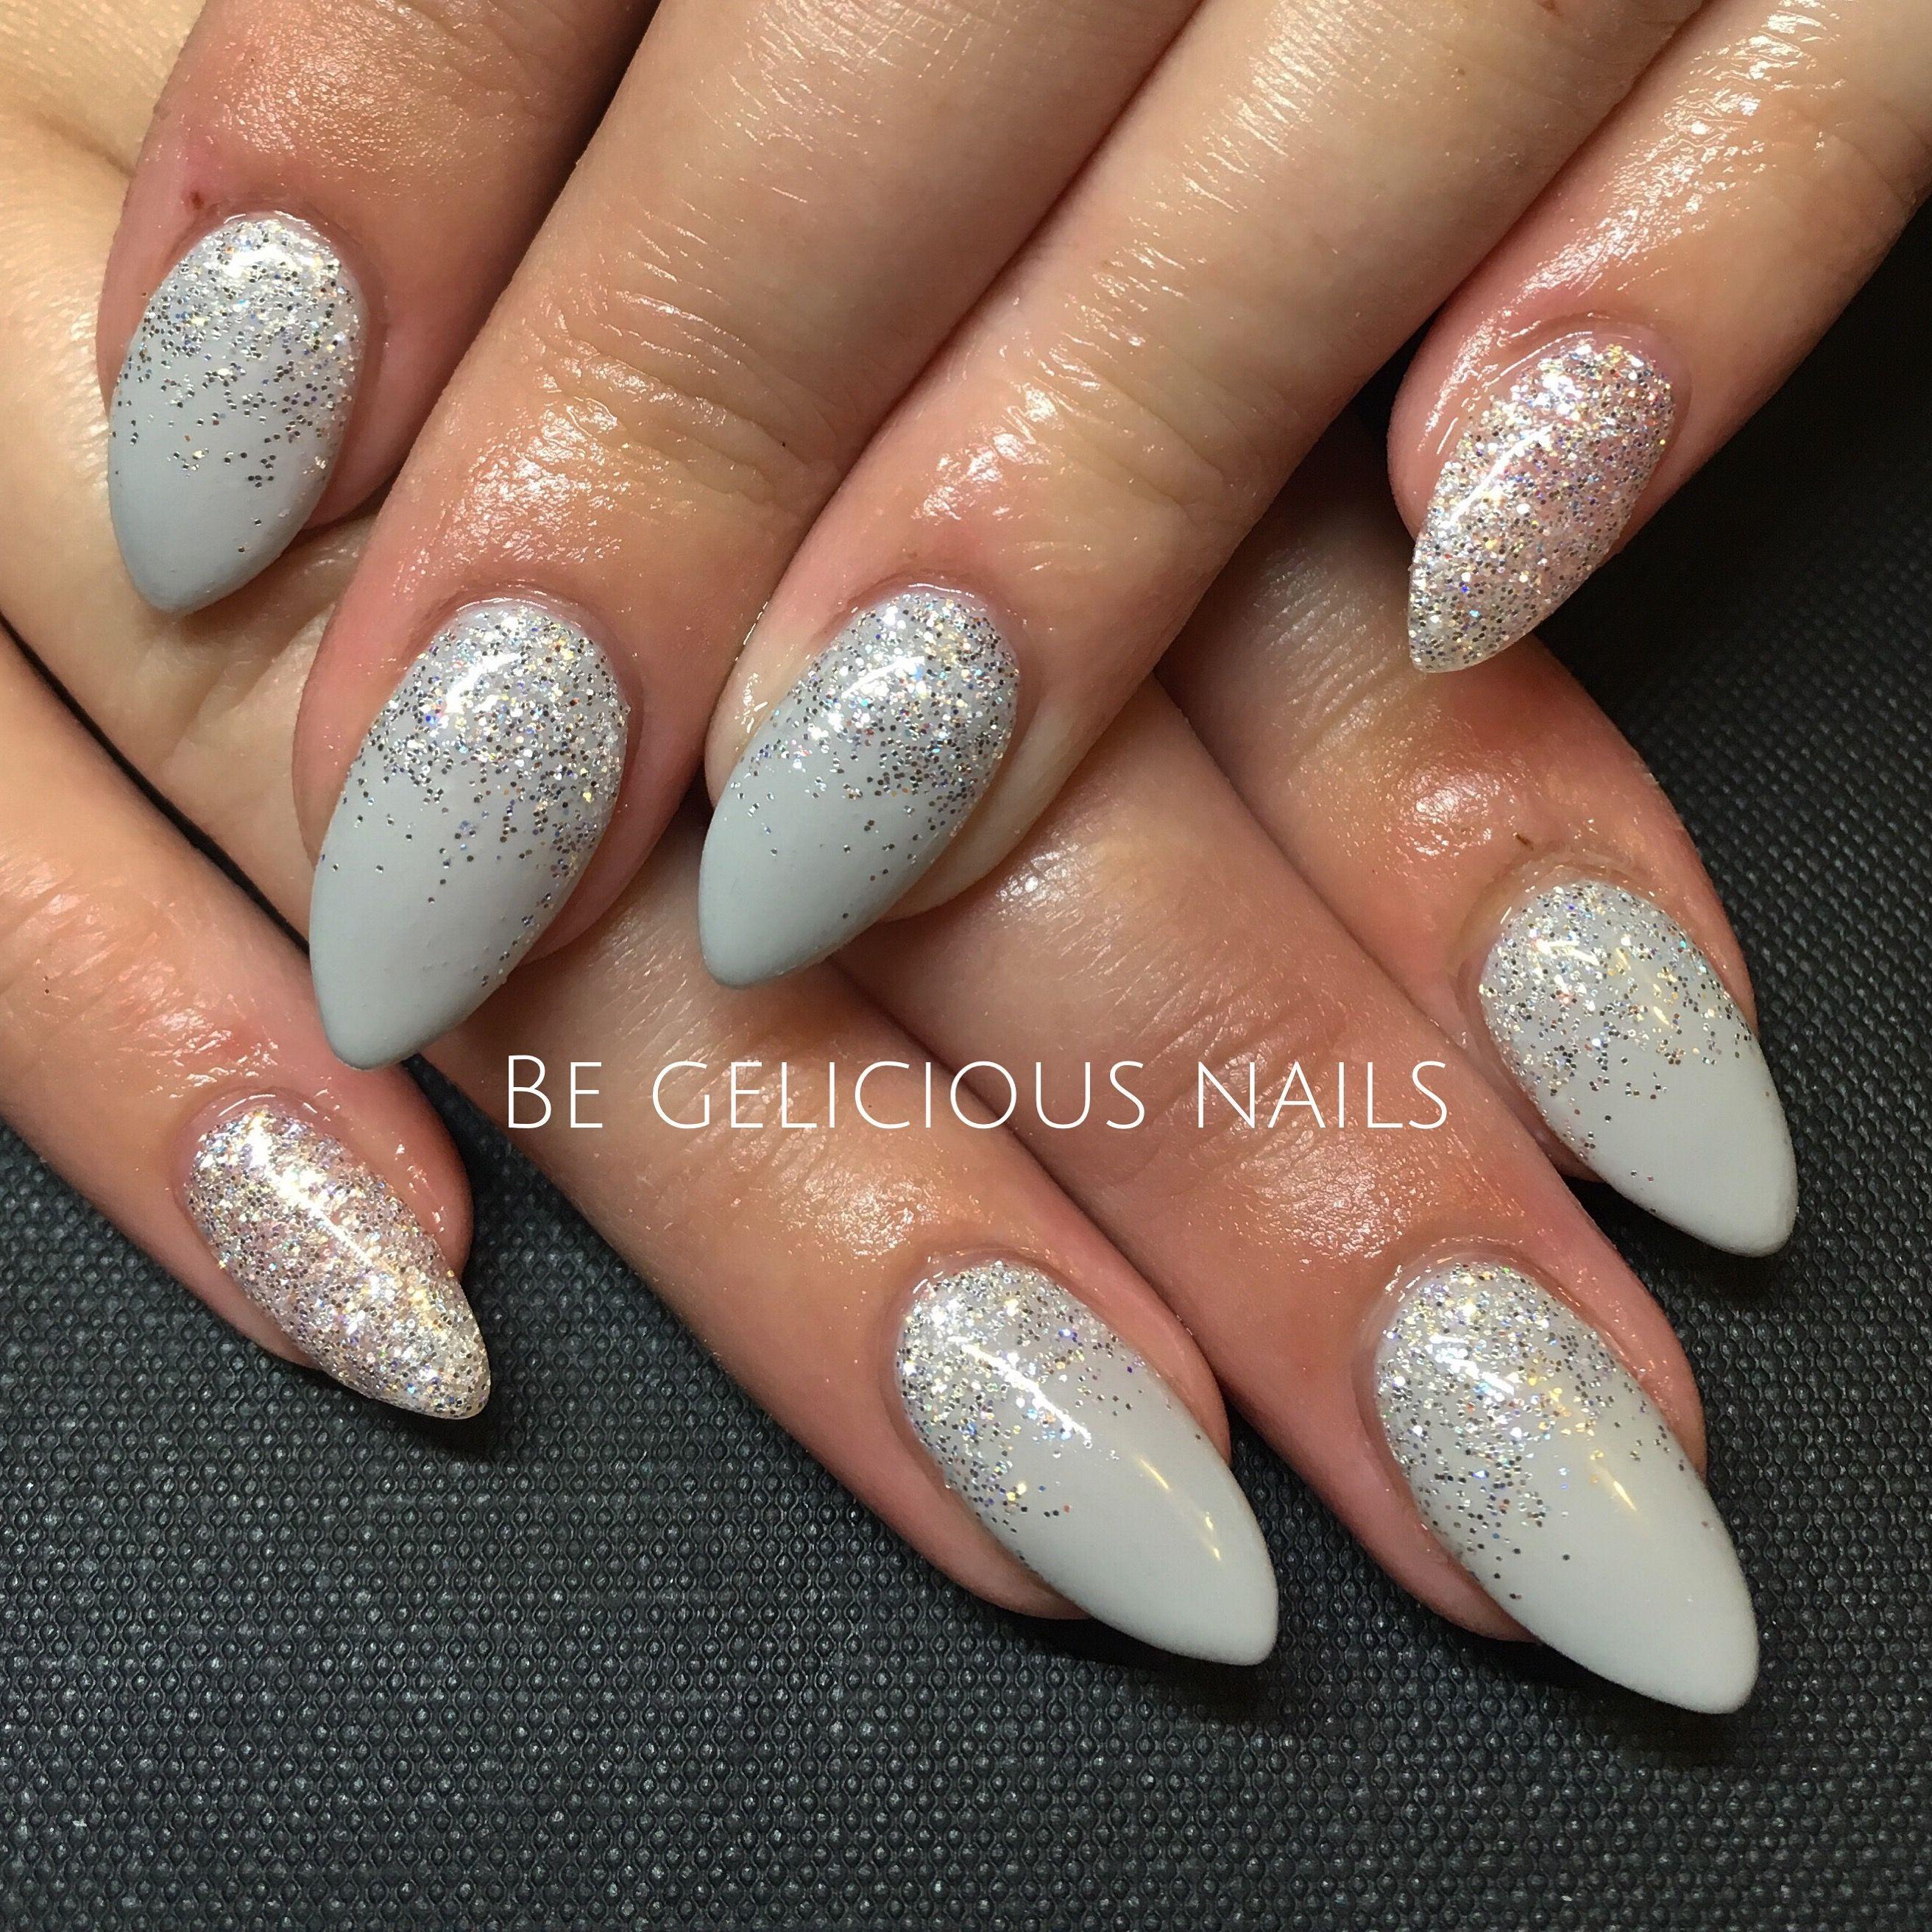 Calgel Nails Gel Nail Art Design Grey Glitter Pointy